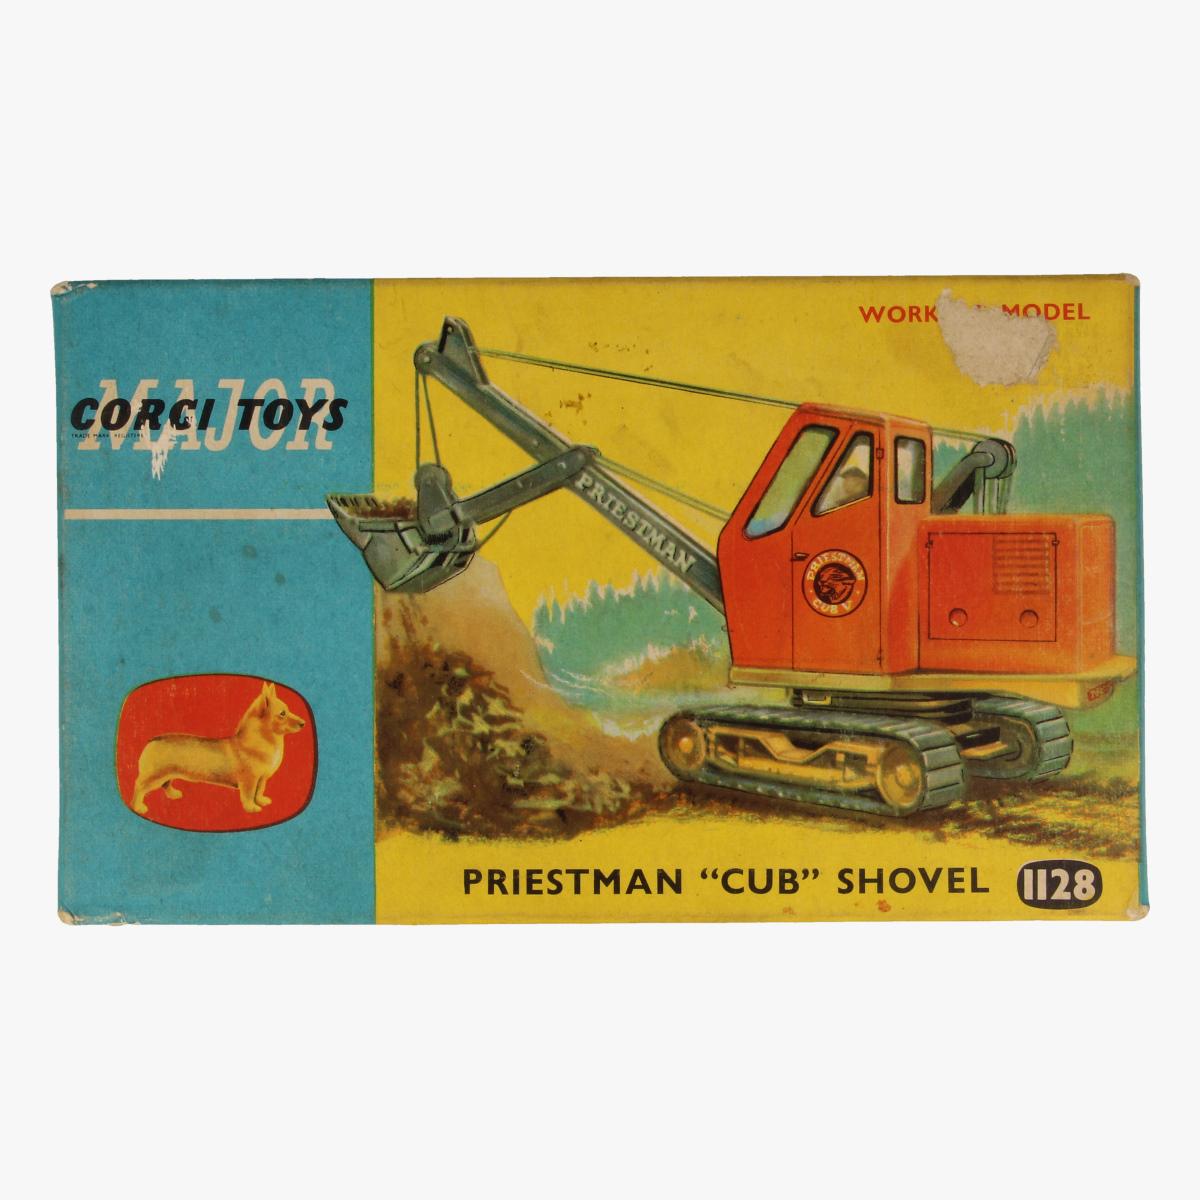 "Afbeeldingen van Corgi Toys. Priestman ""Cub"" Shovel. Nr. 1128"